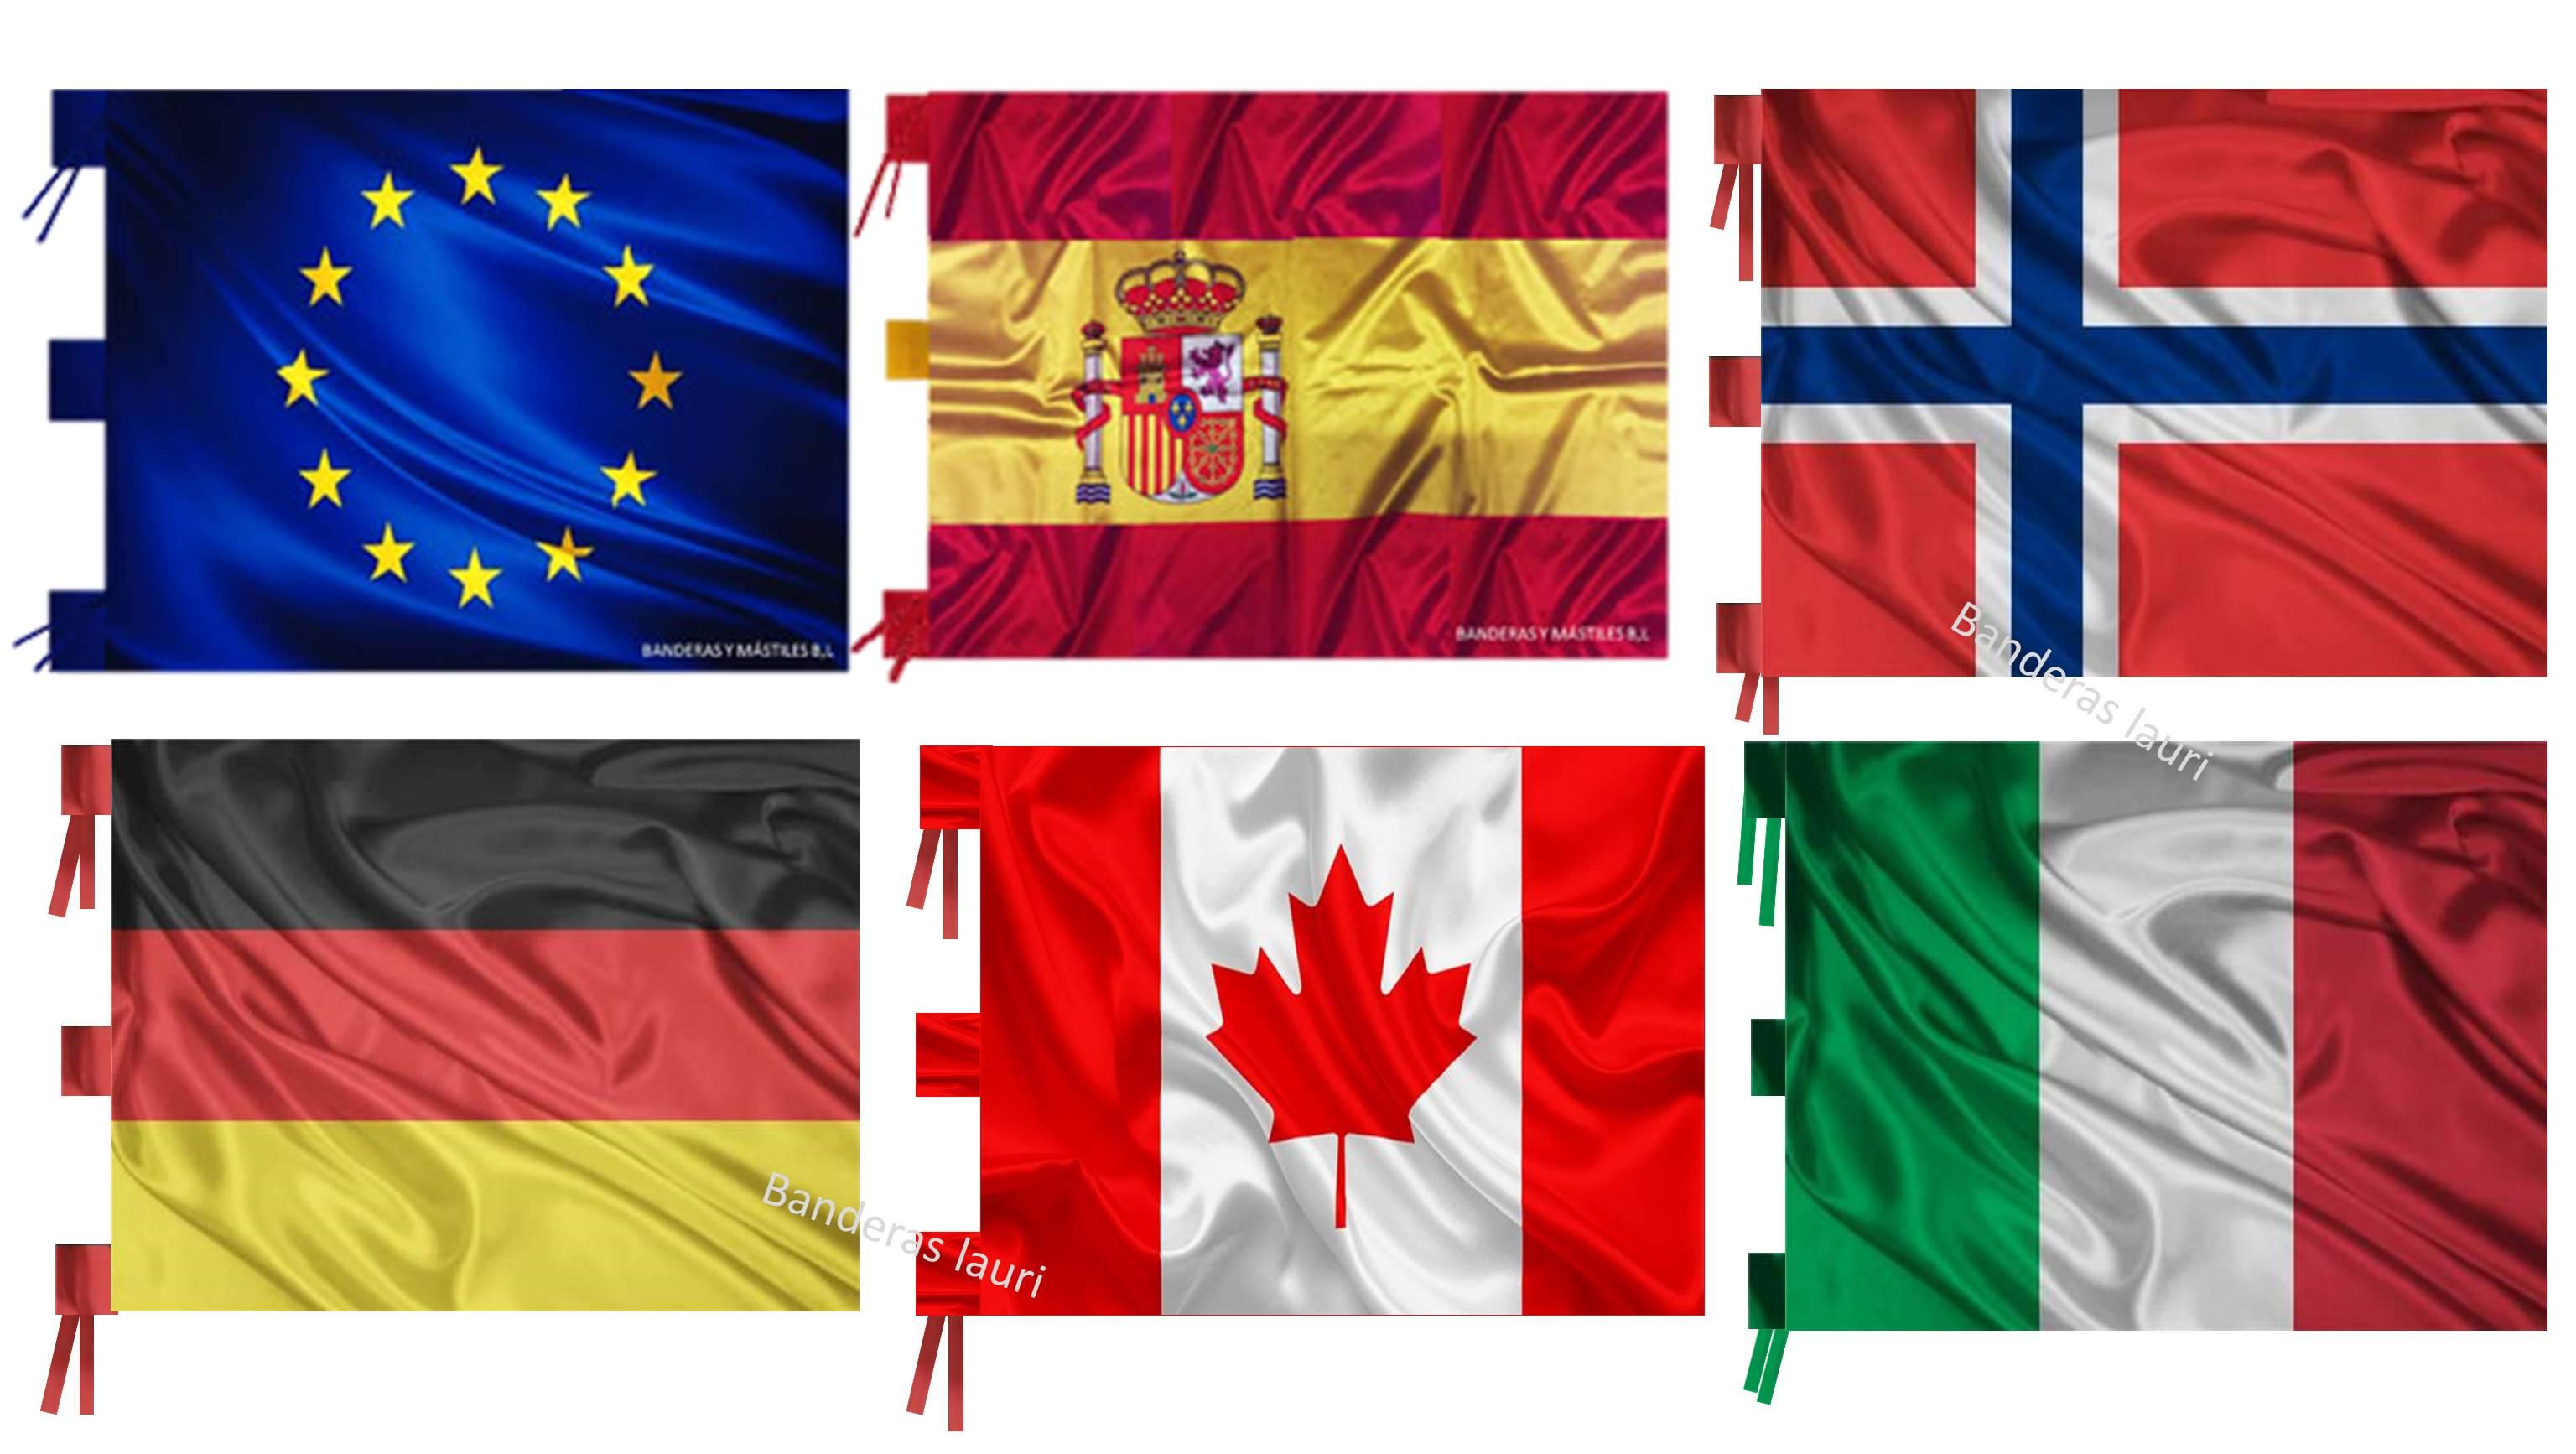 Banderas de interior paises comunidades autonomias provincias ayuntamientos eventos